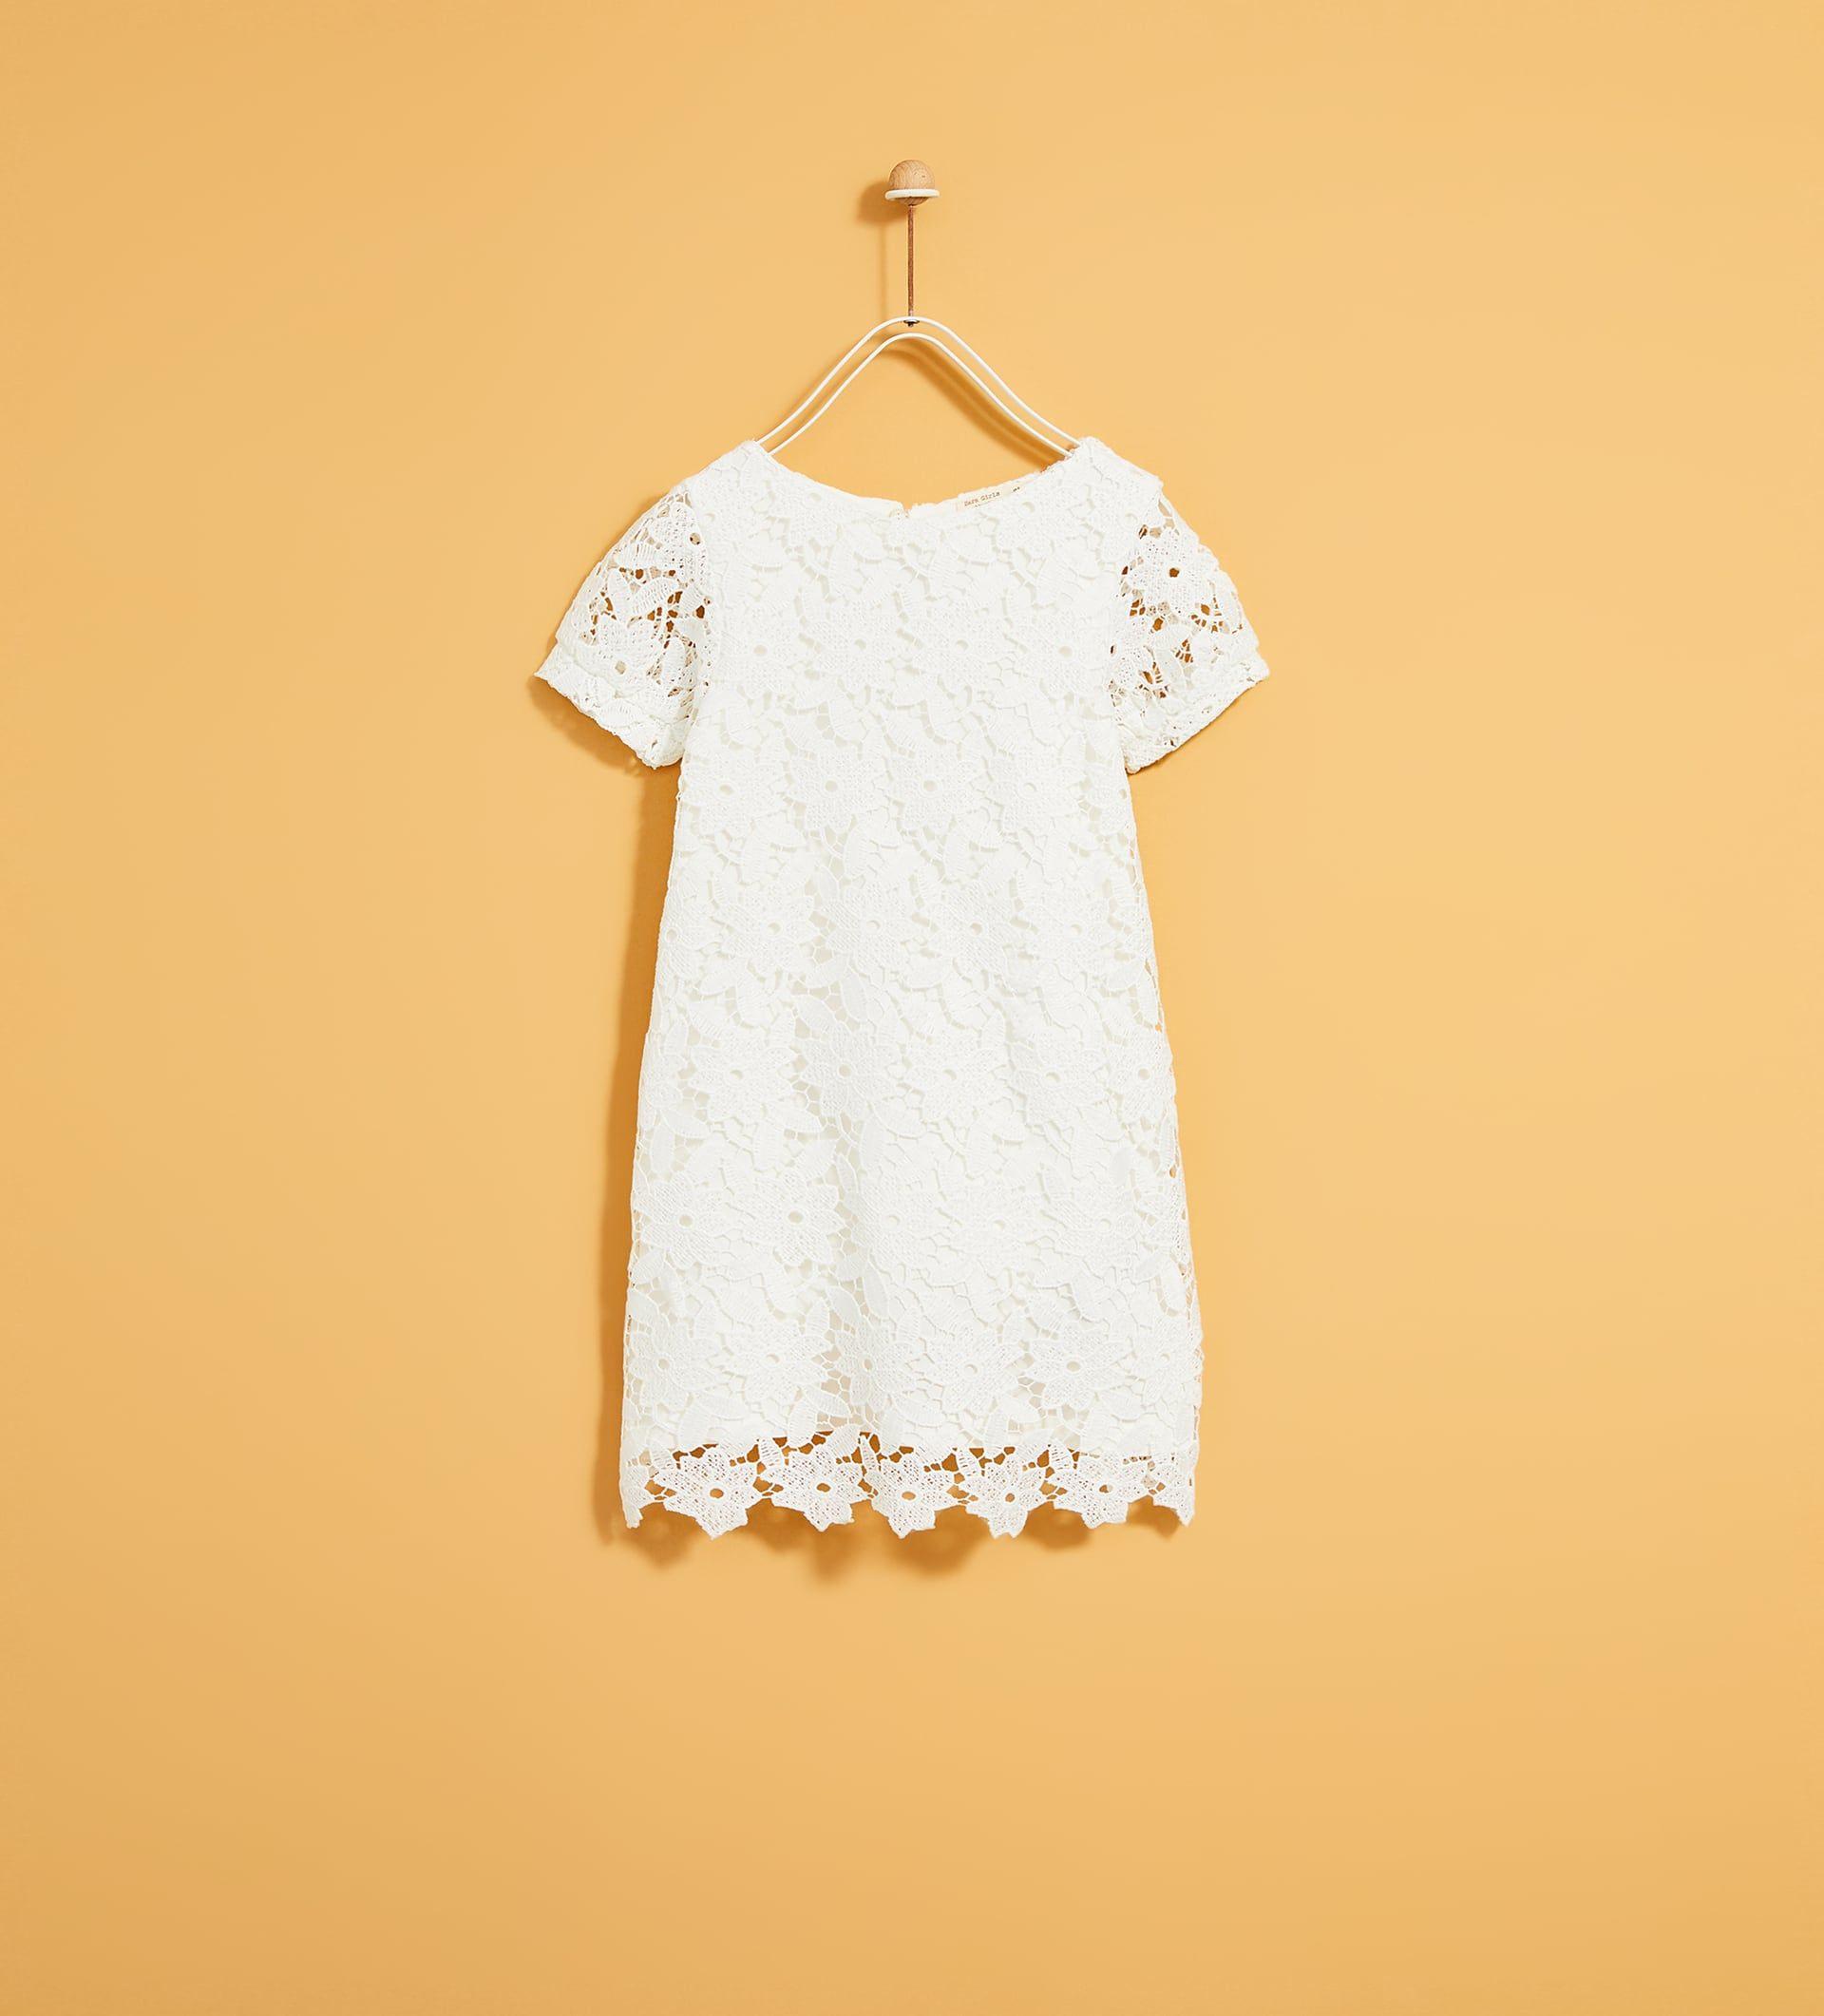 Zara  Kids  Guipure Lace Dress  Kleider Kleid Spitze